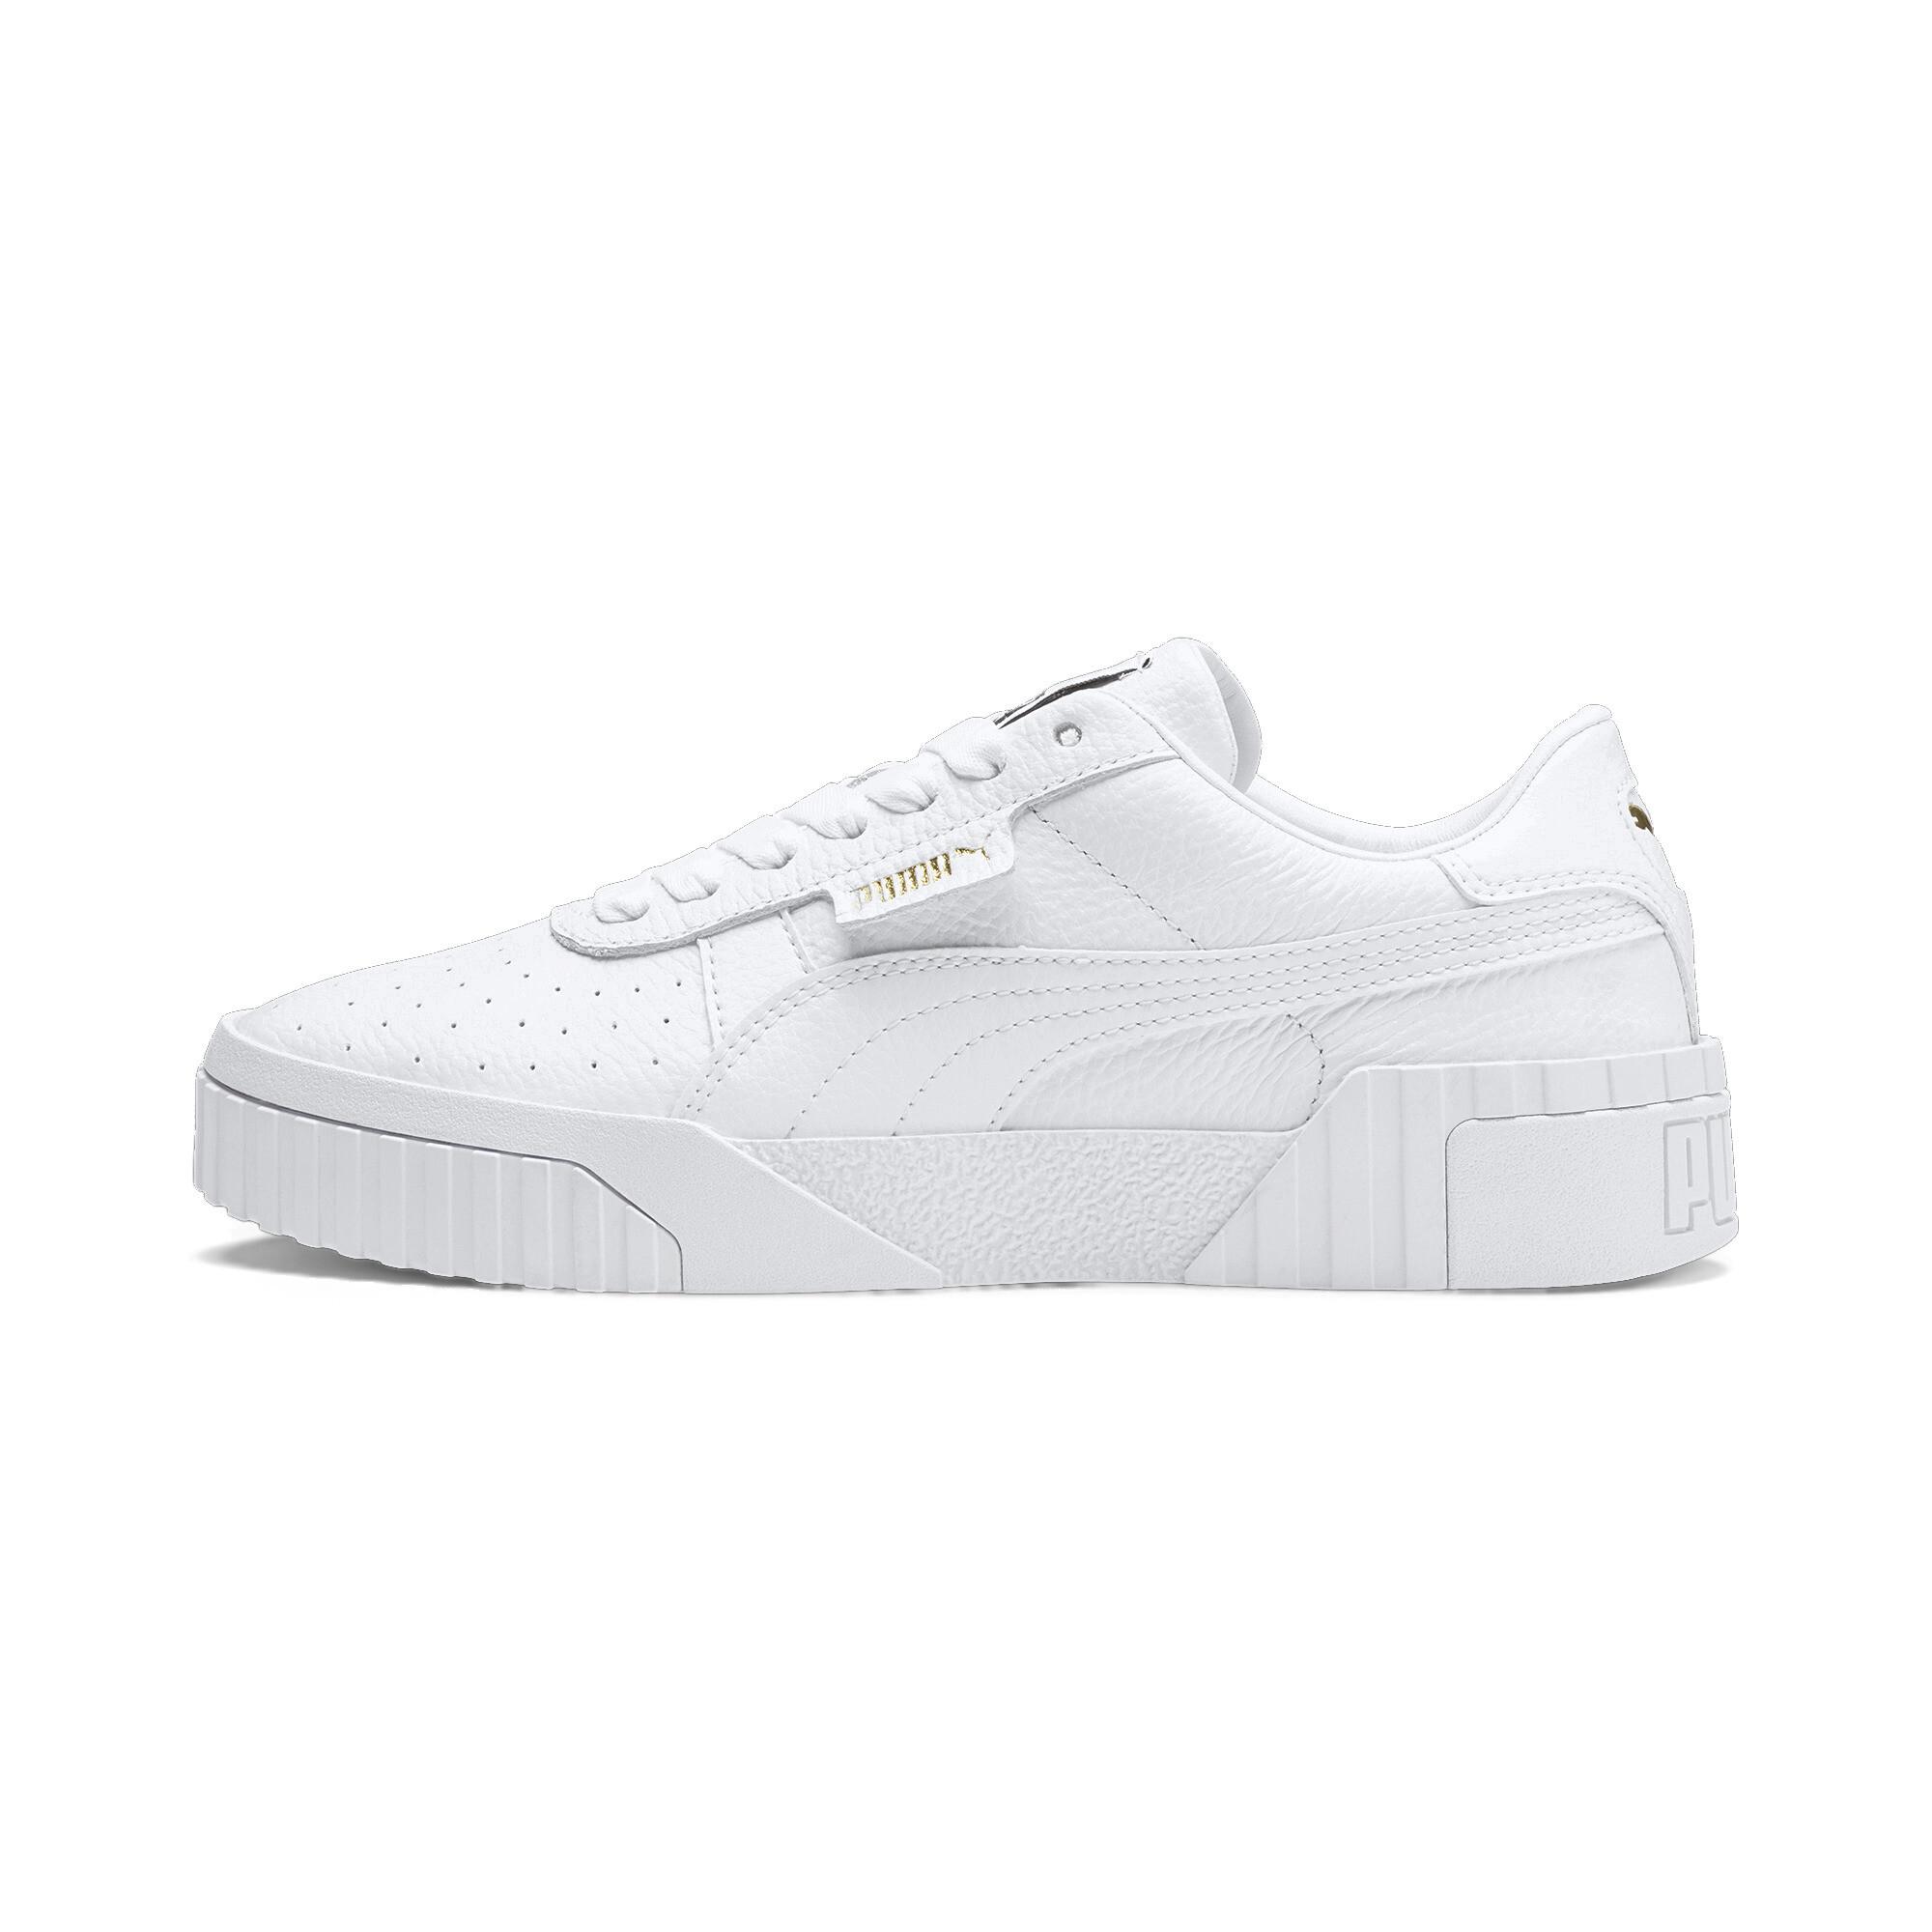 PUMA-Women-039-s-Cali-Sneakers thumbnail 9